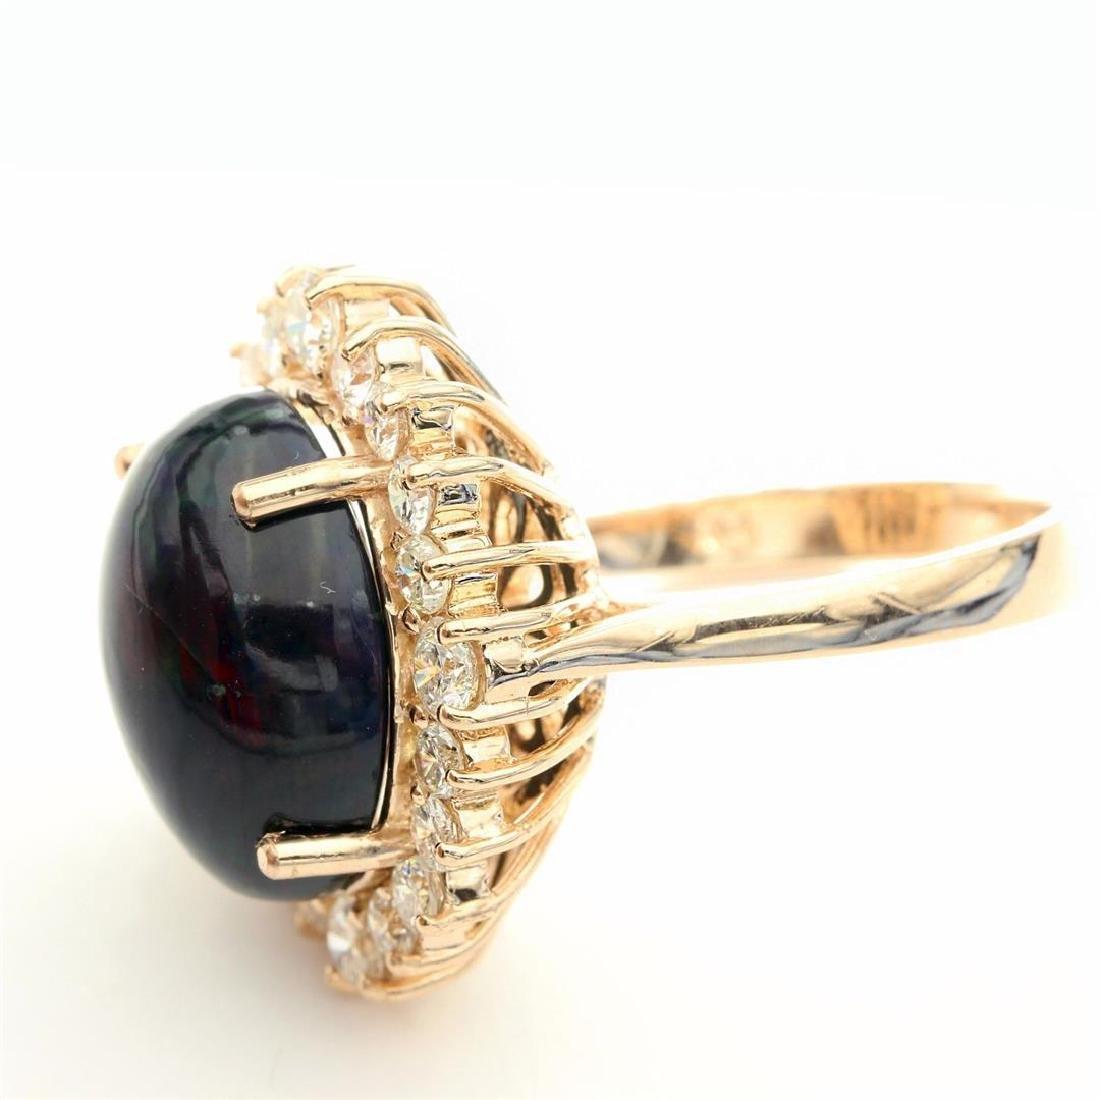 7.46 Carat Natural Diamonds & Opal Anniversary Ring in - 9